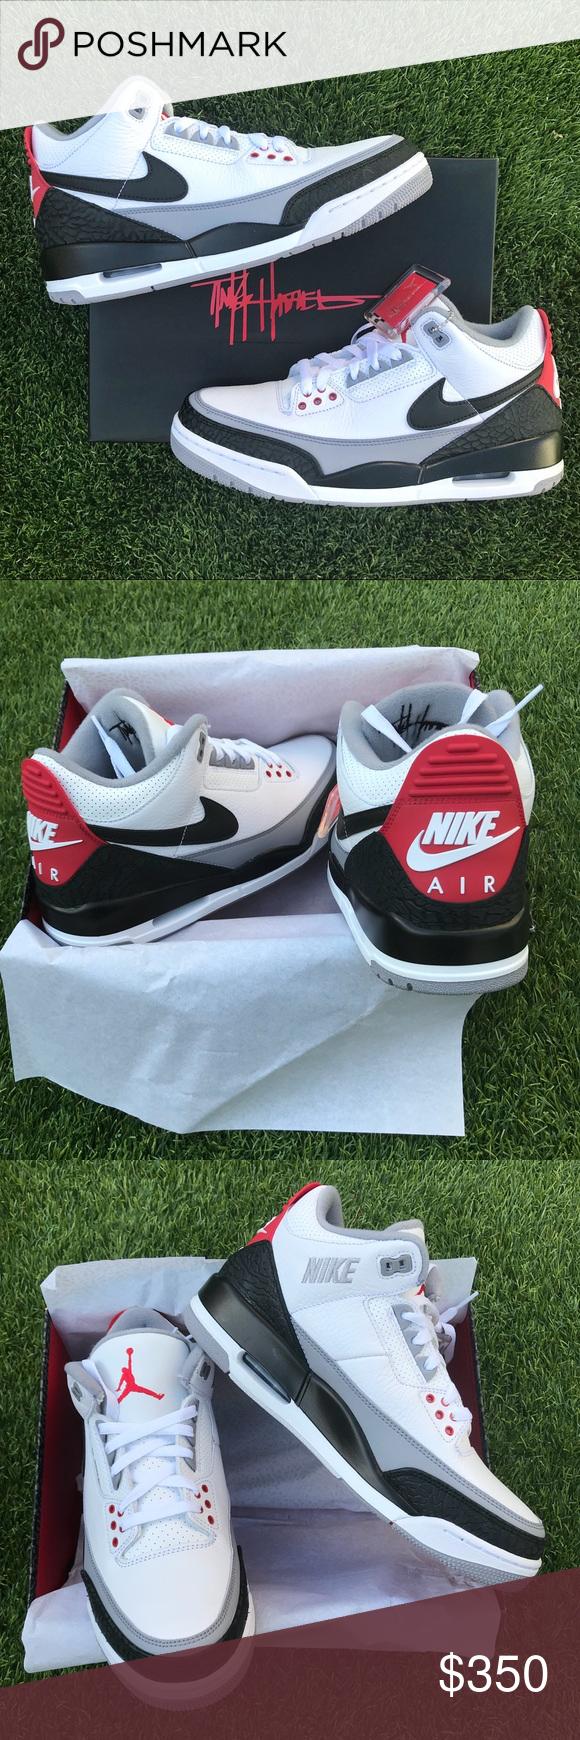 b4d5c8fd08c Air Jordan 3 Retro Tinker Hatfield NRG Brand  Jordan Item name  Air Jordan 3